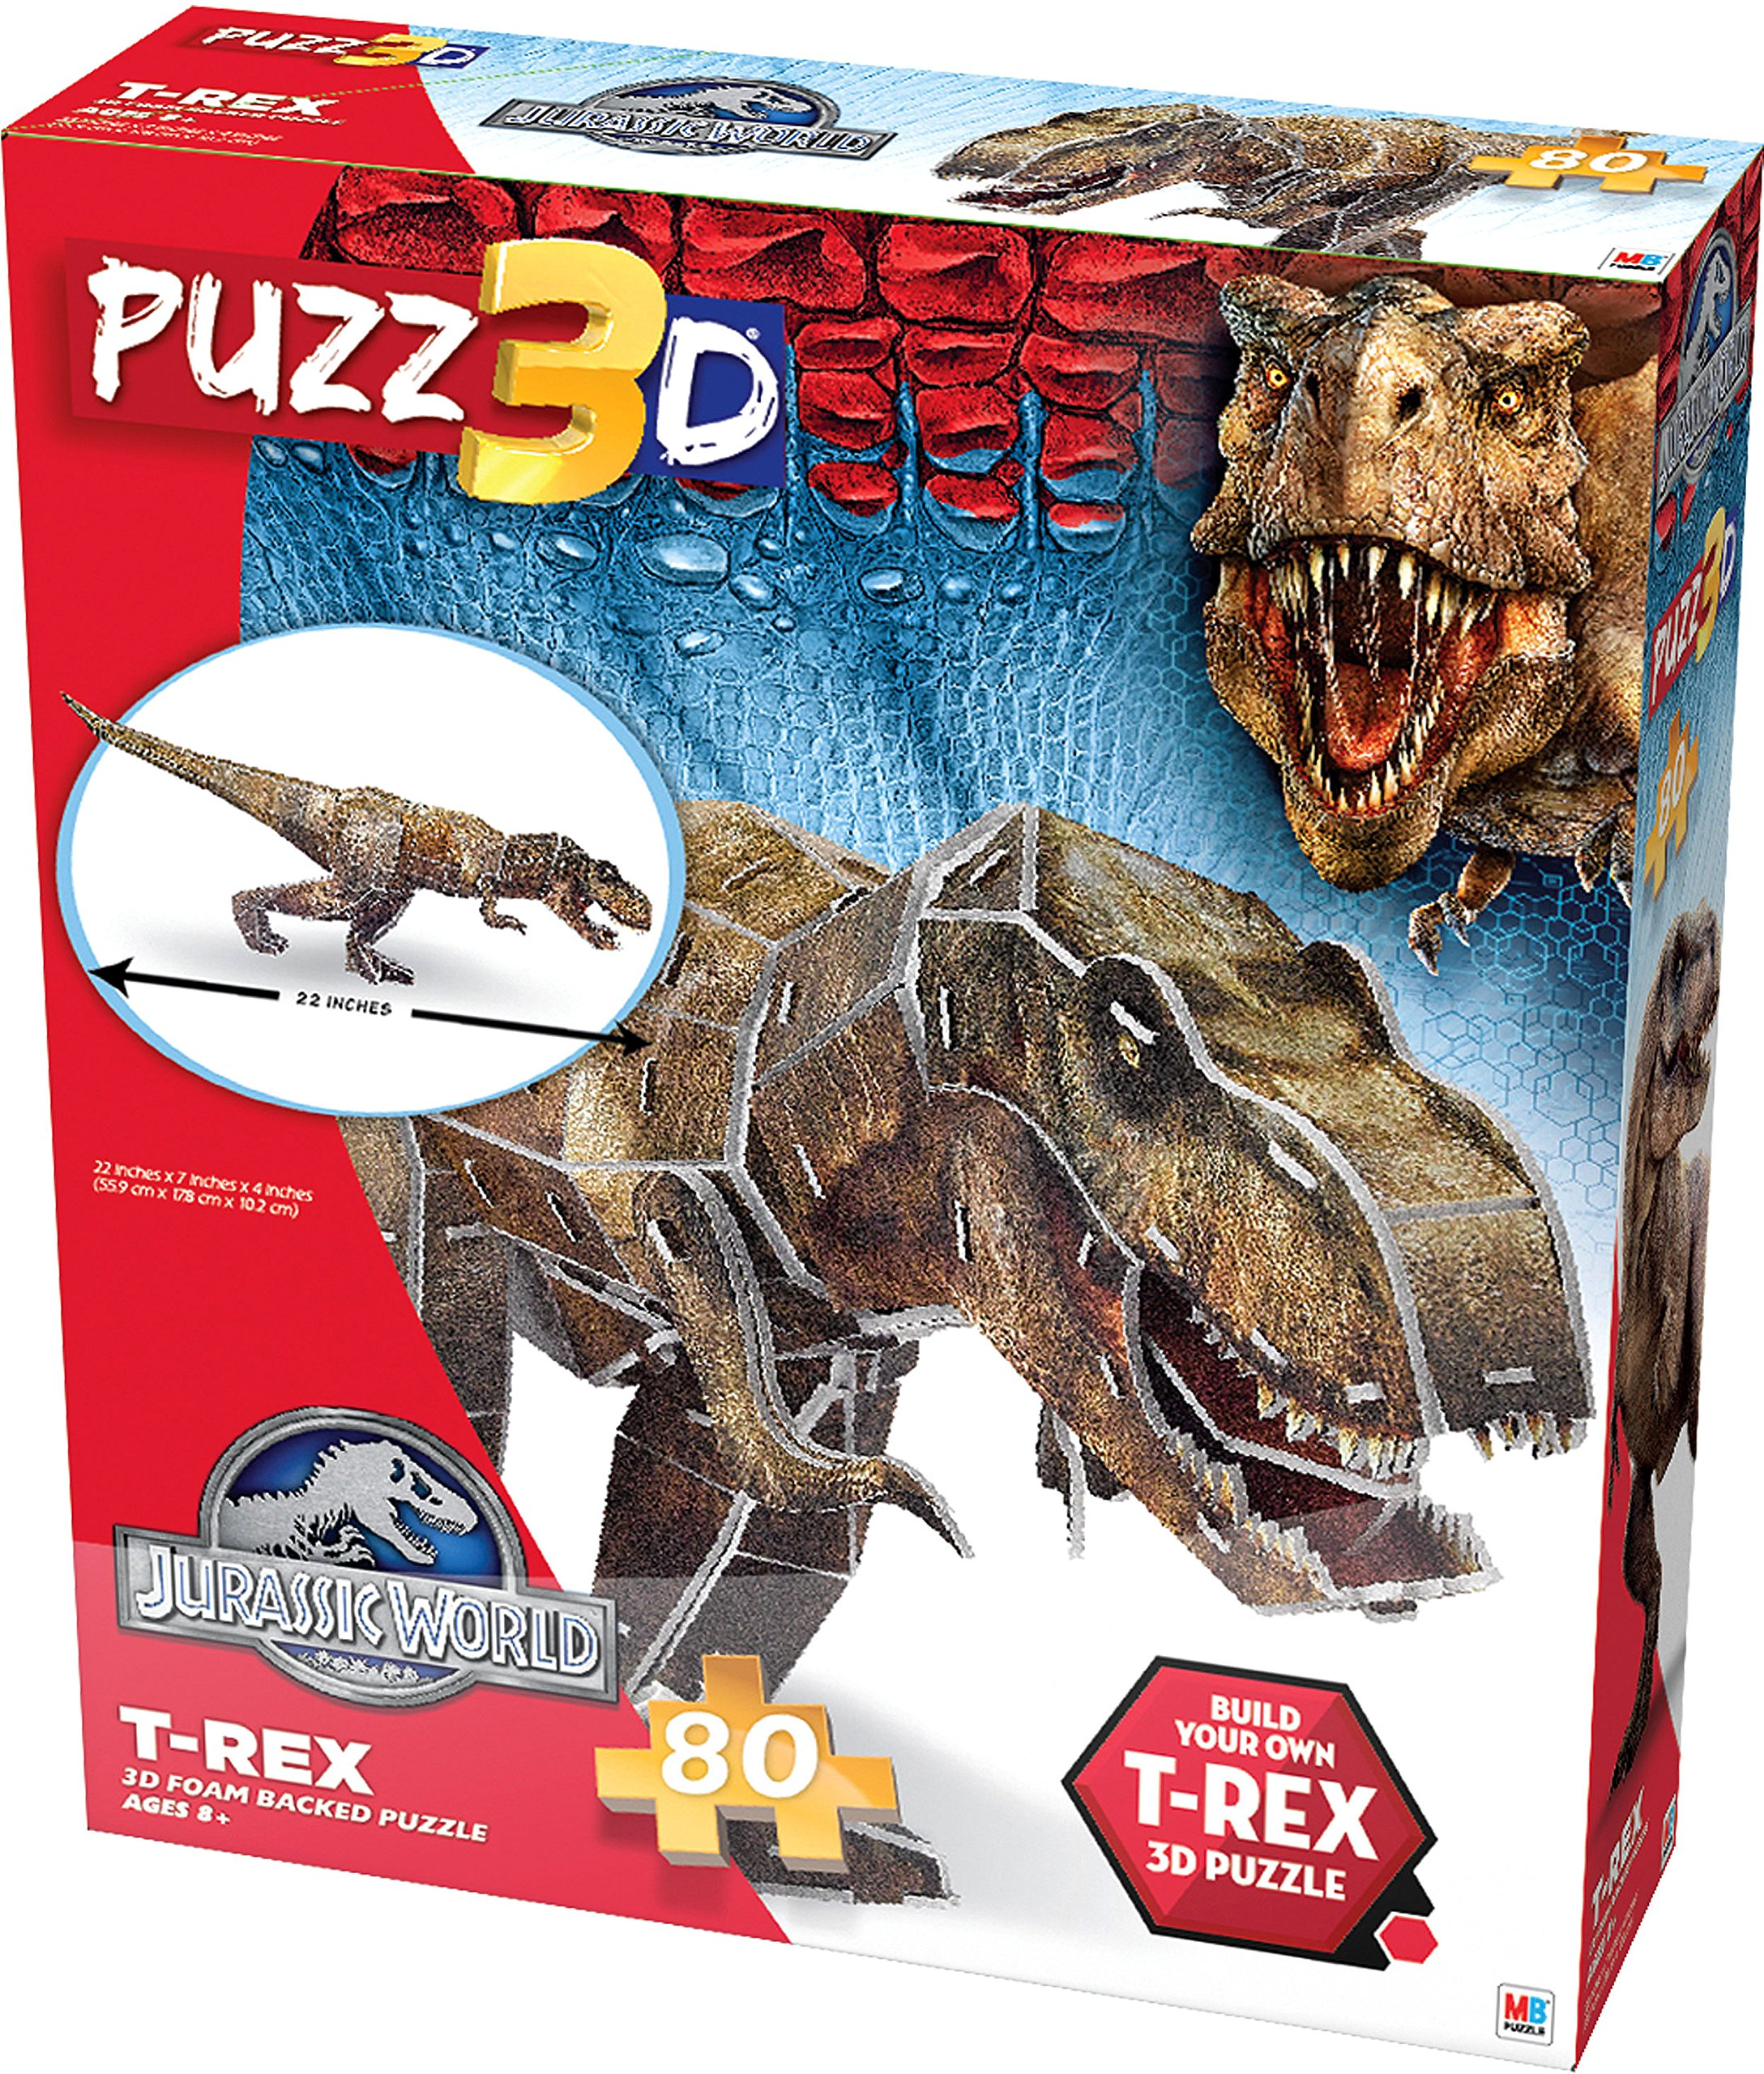 Jurassic World Puzzles